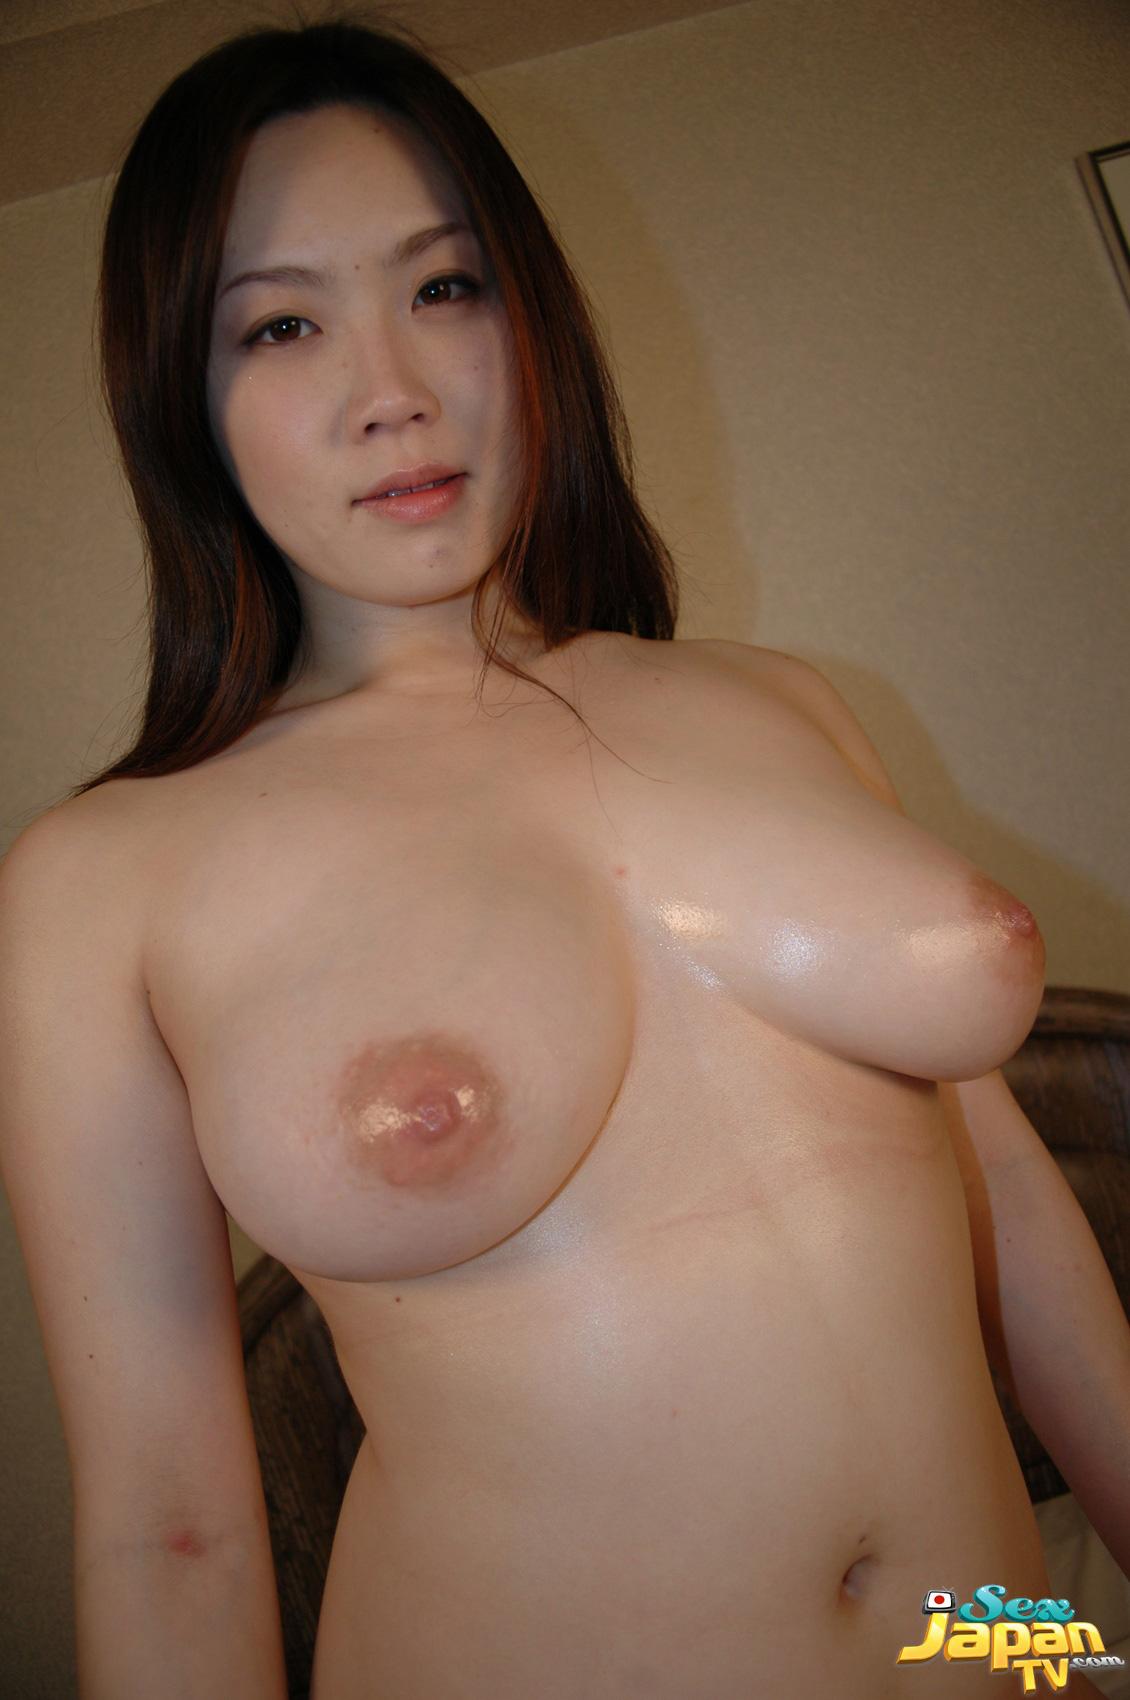 girl-with-huge-tits-hardcored